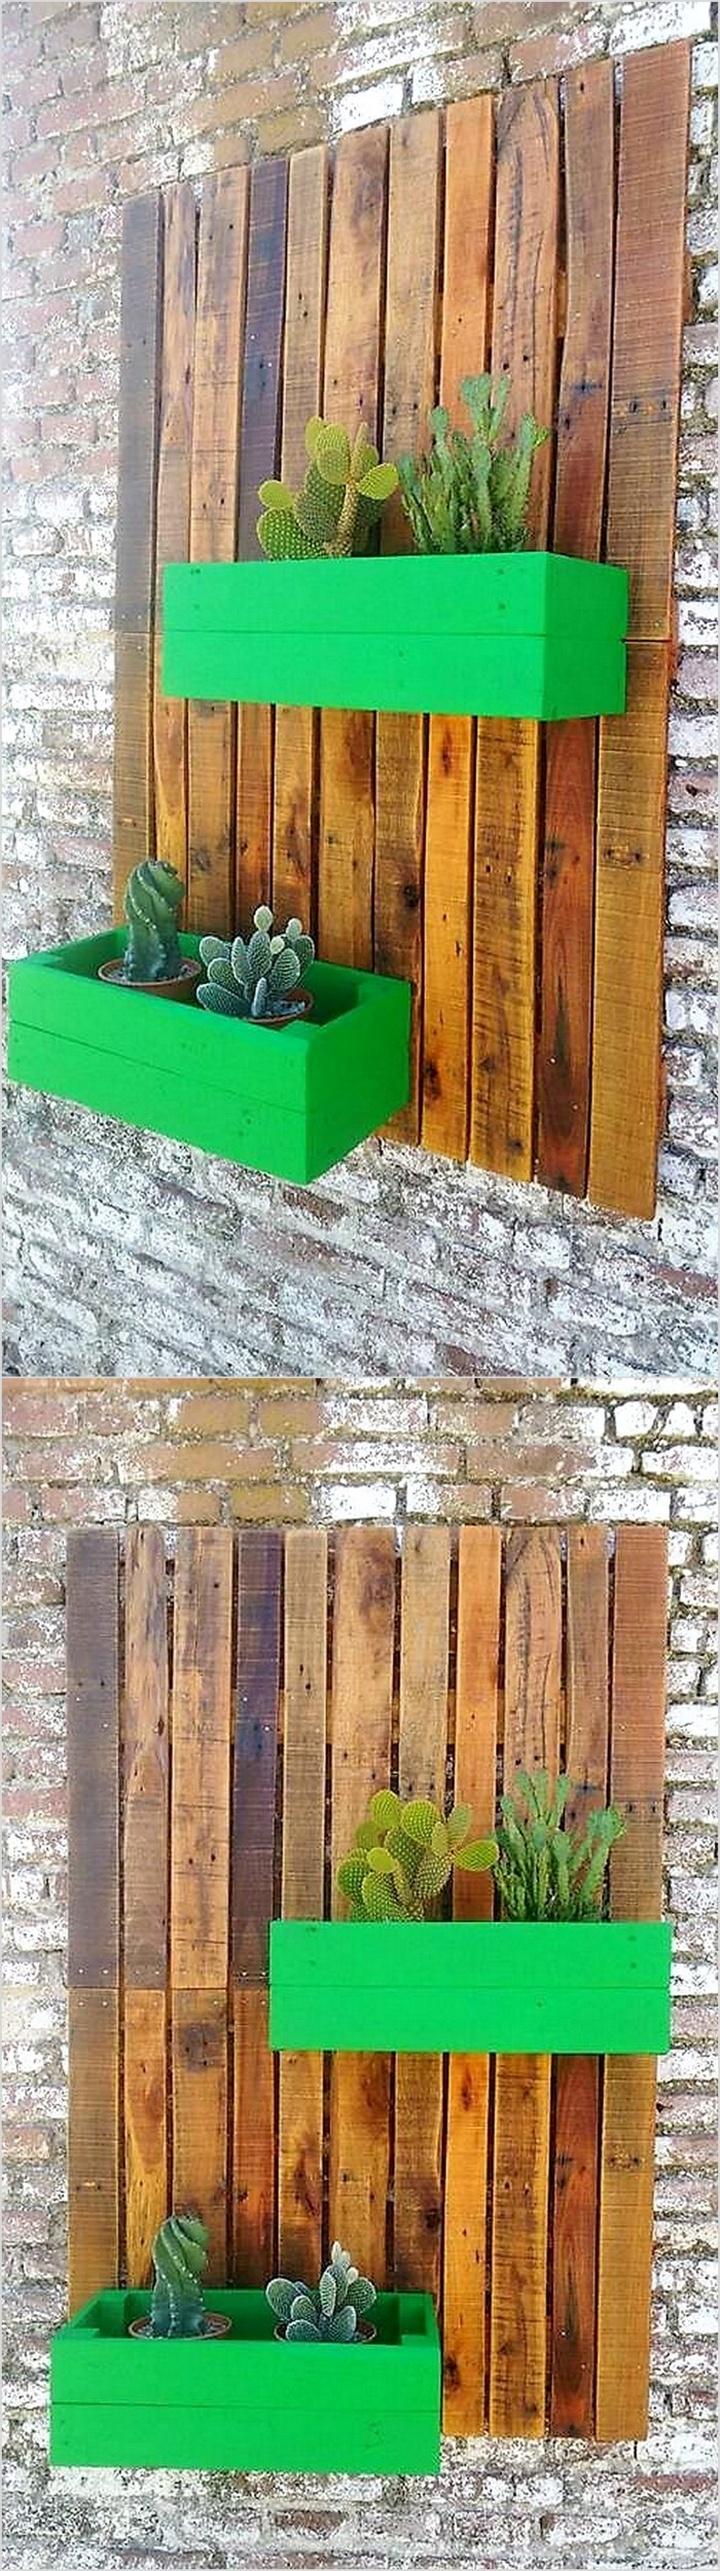 pallet-wall-planter-idea